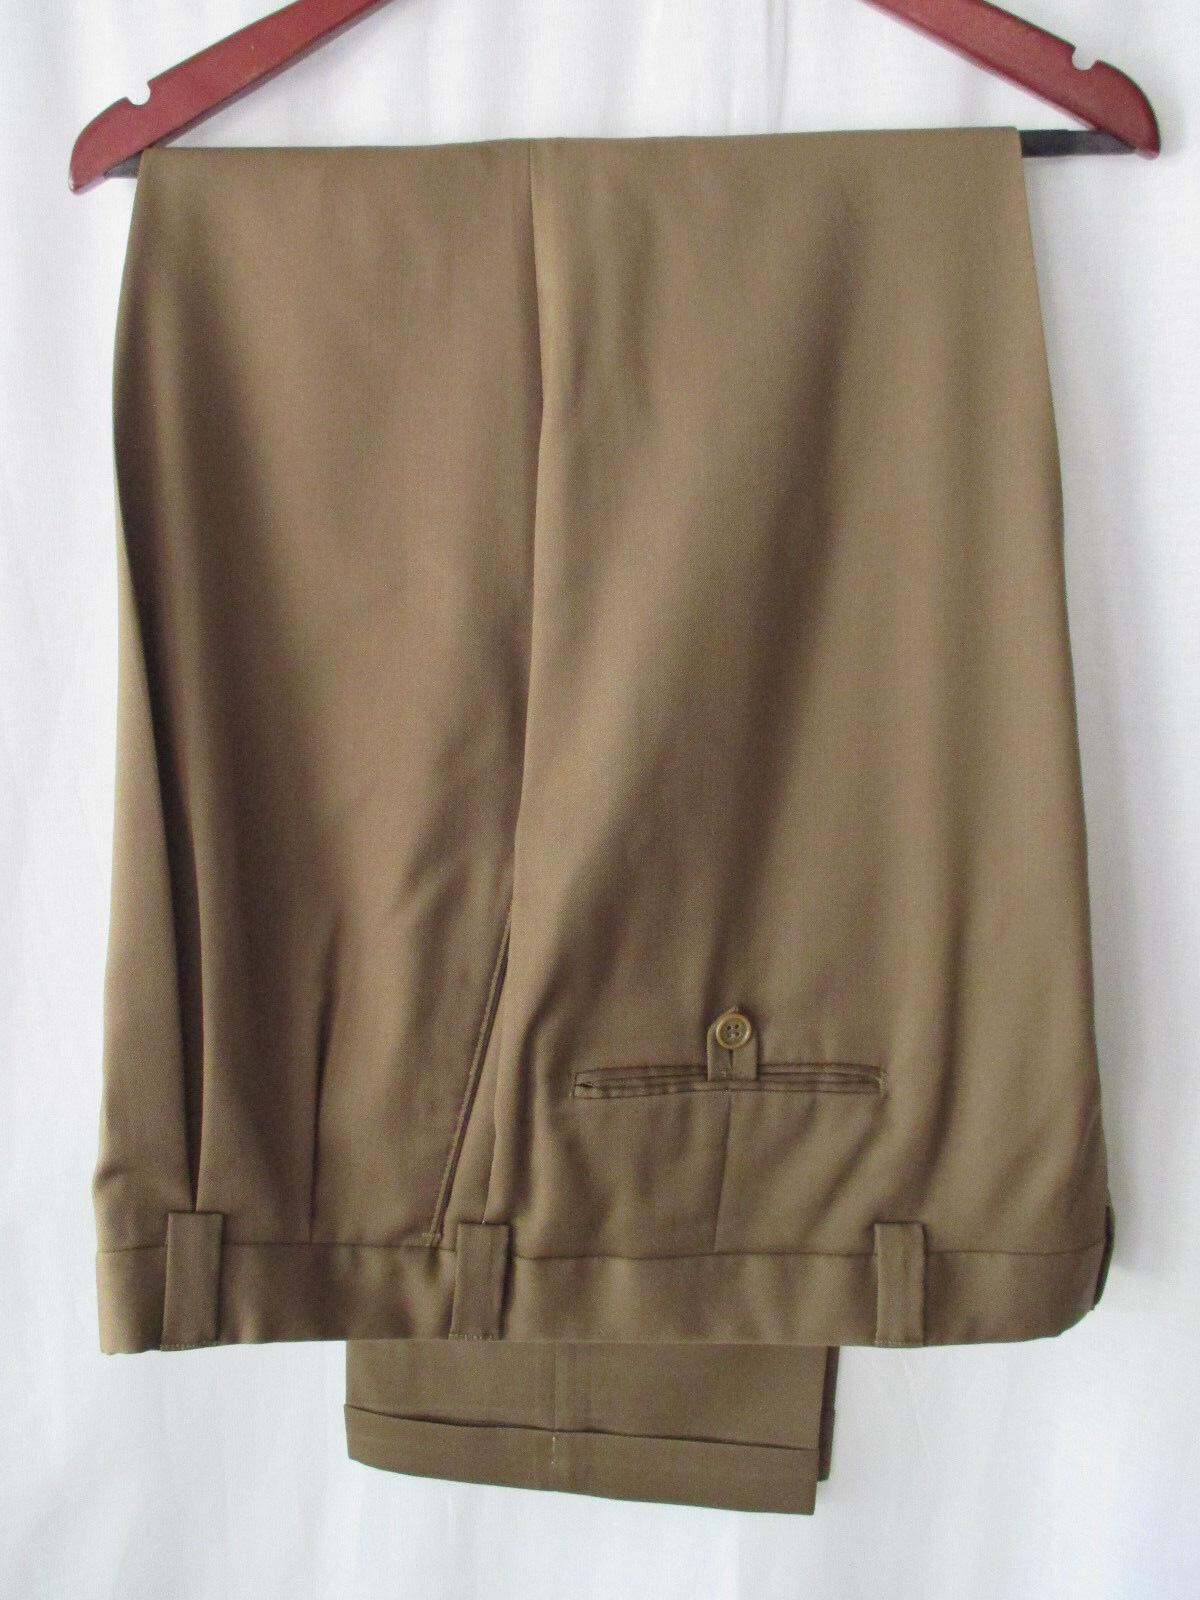 Murano Men's Dress Pants 40x32 Brown Polyester